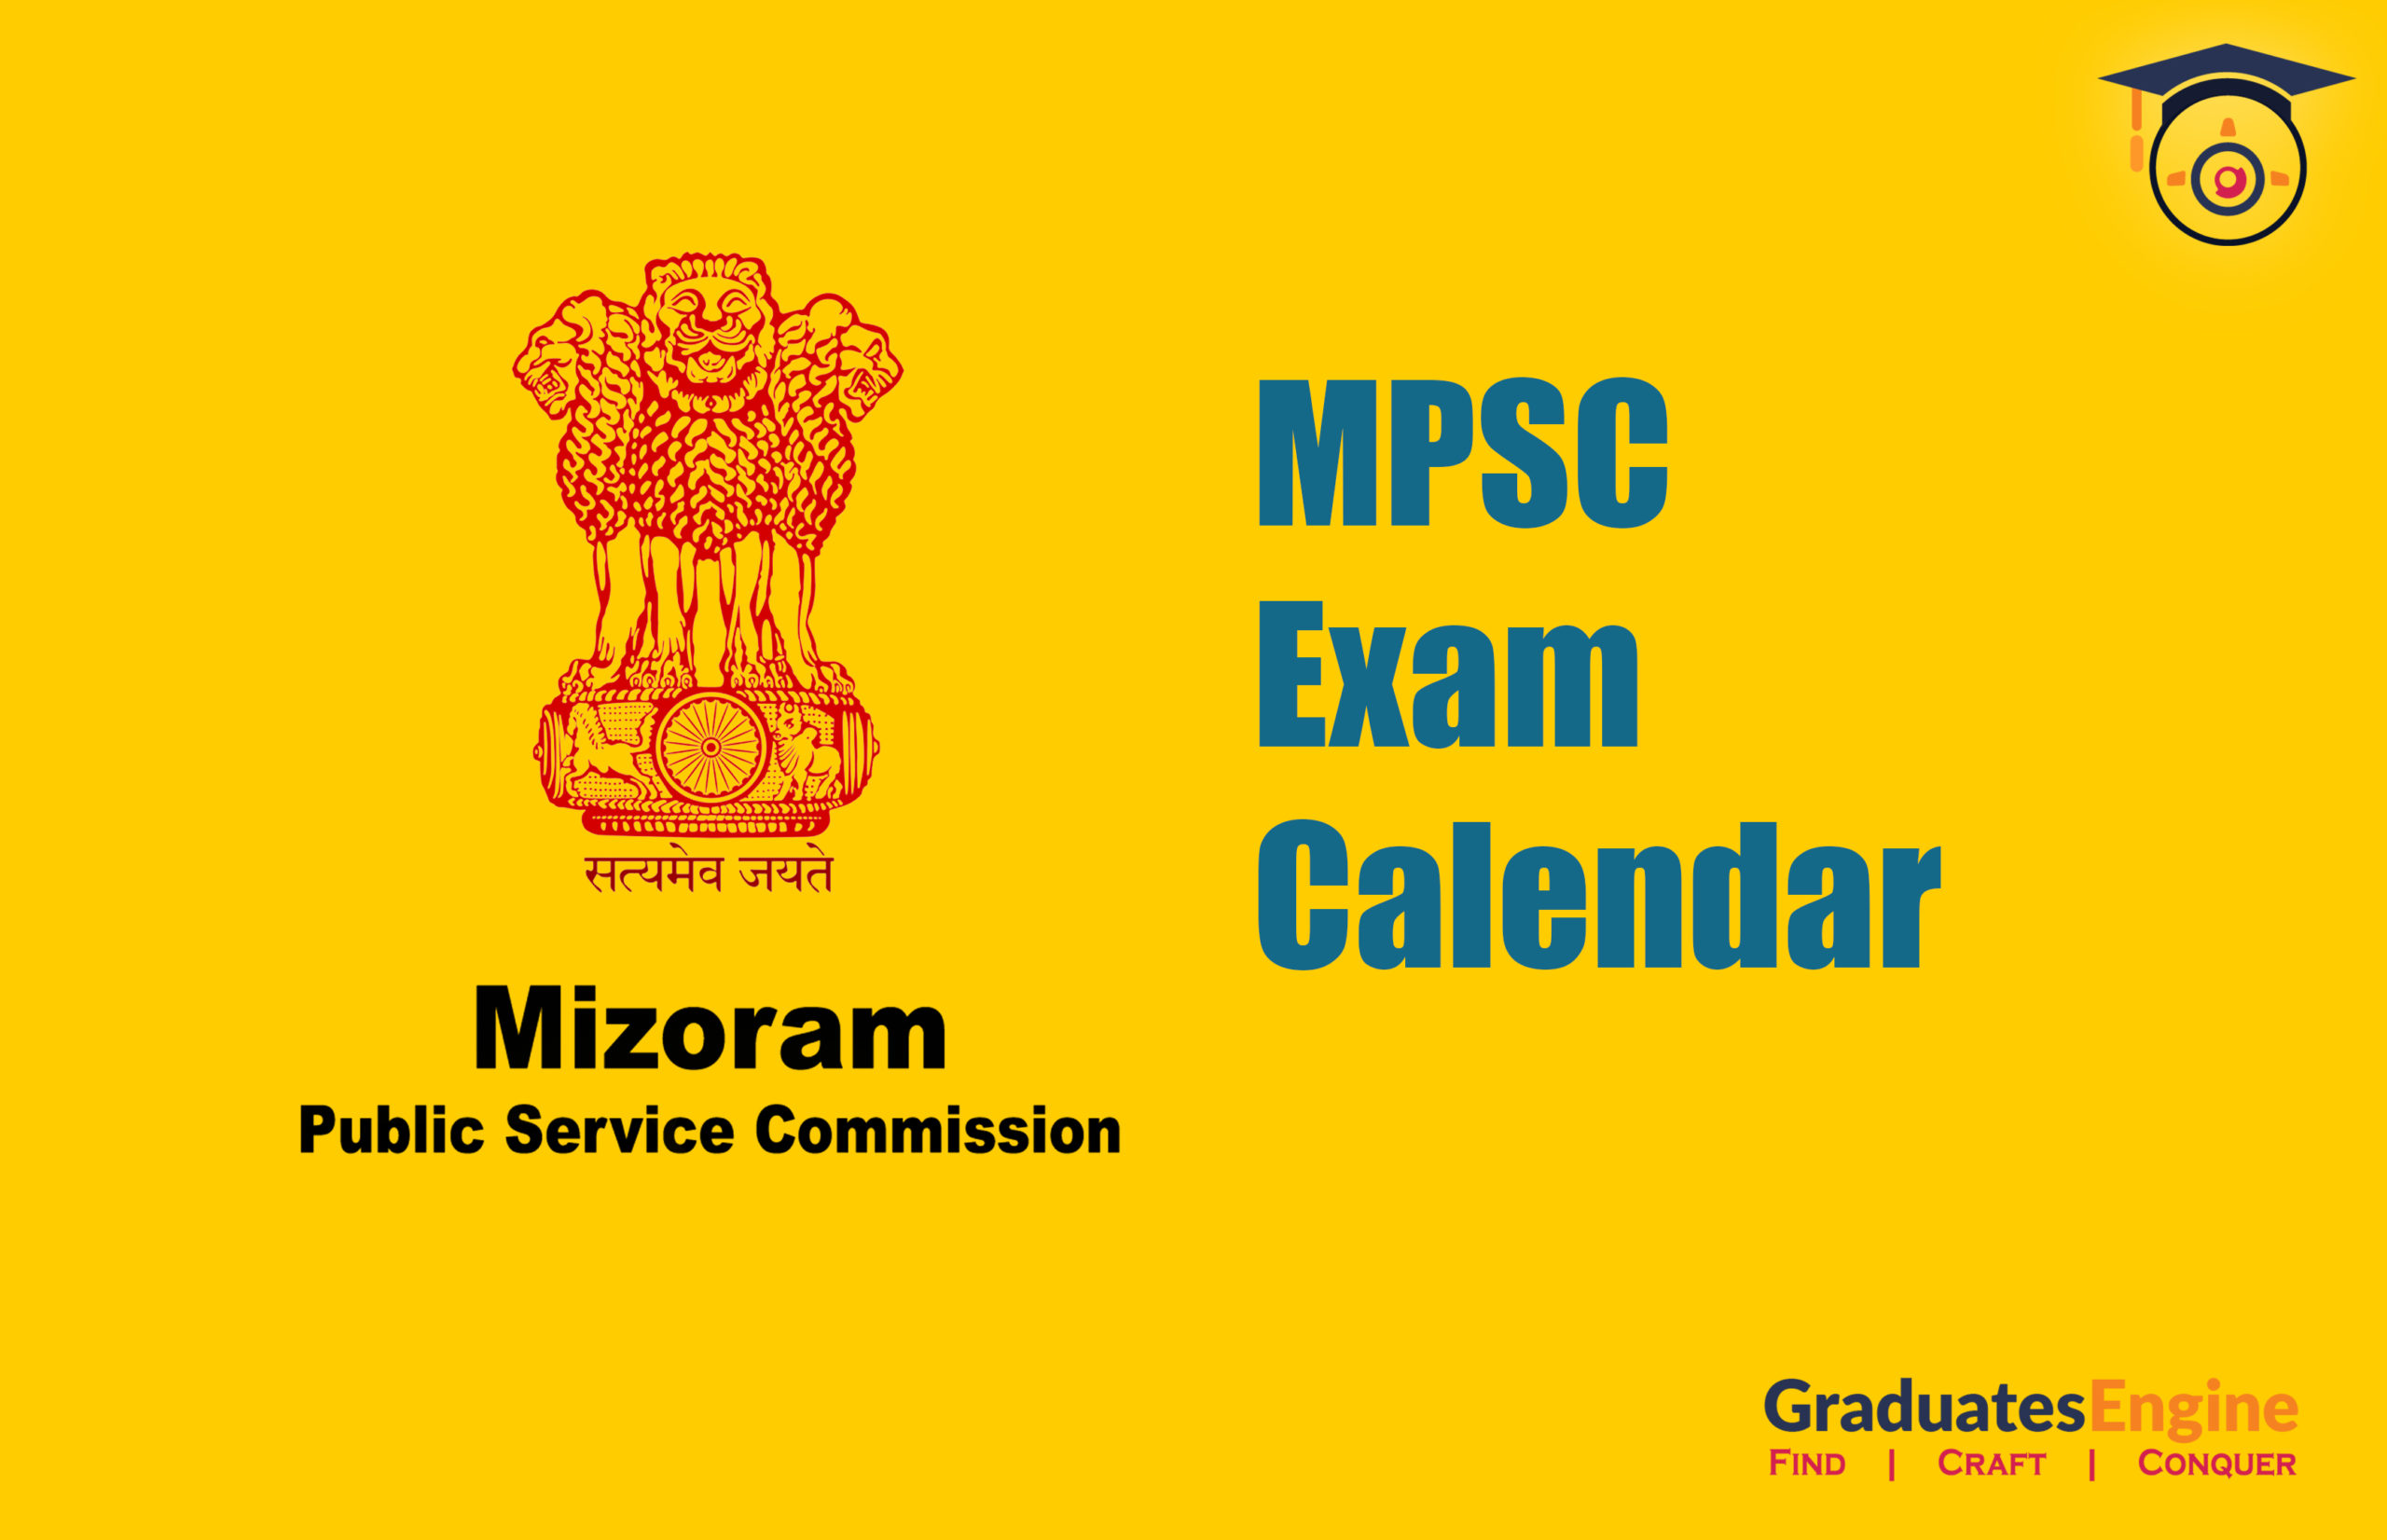 Mizoram Public Service Commission – MPSC | Exam Calendar